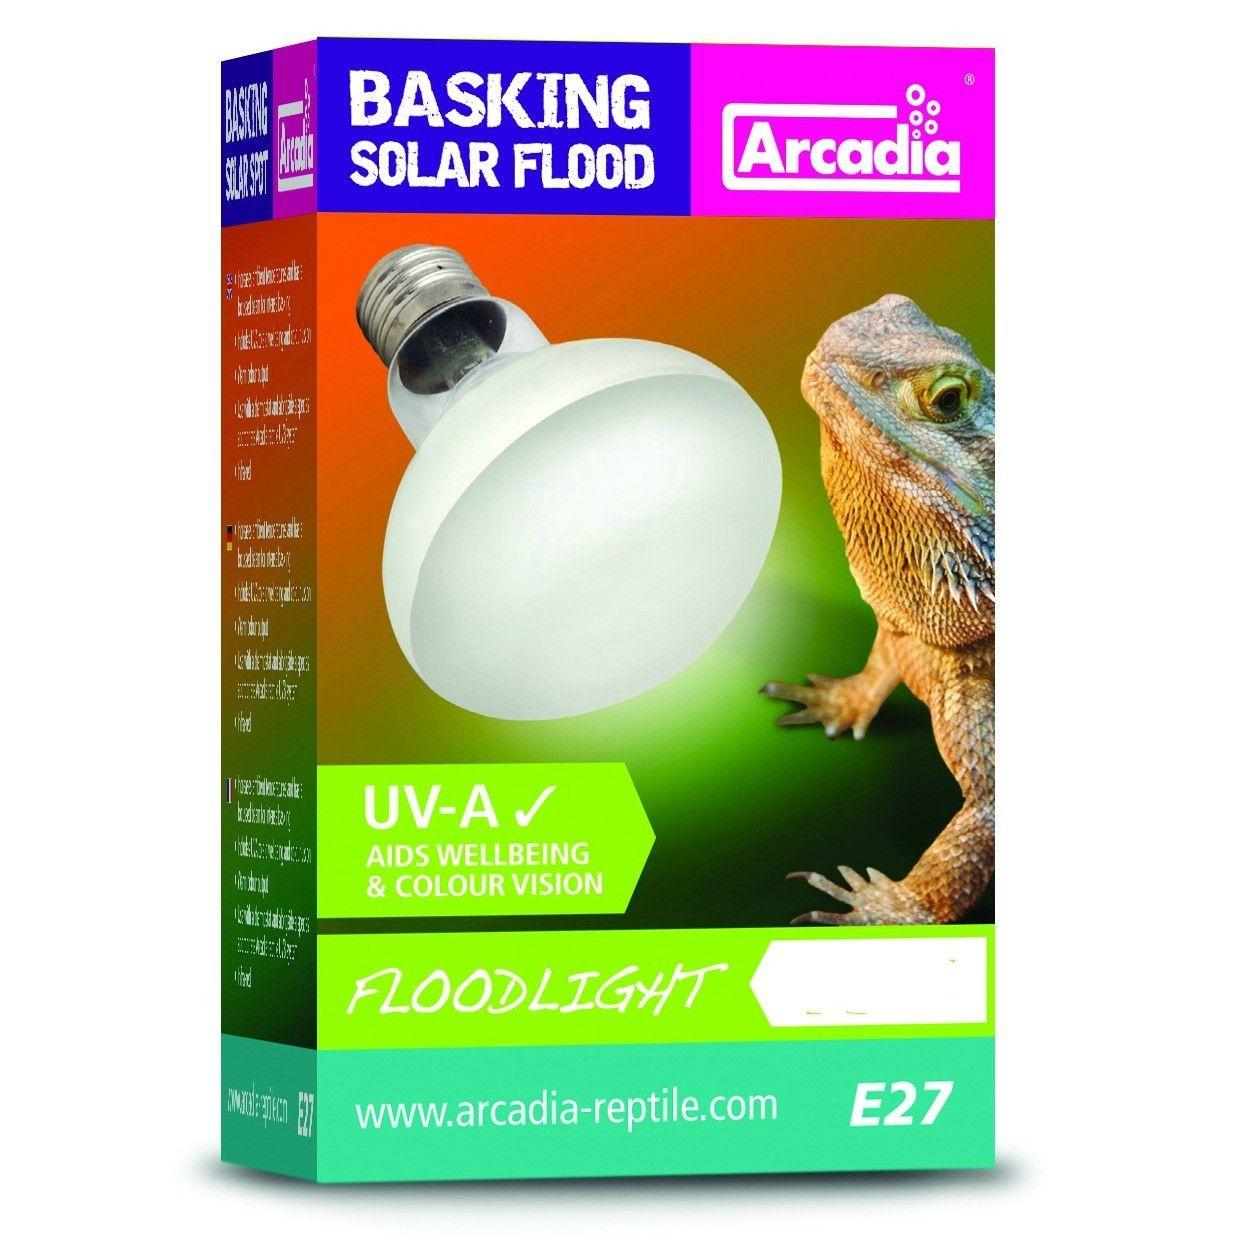 Arcadia Basking Solar Flood Heat Lamp 100w Fraser Promotions Ltd Heat Lamps Solar Flood